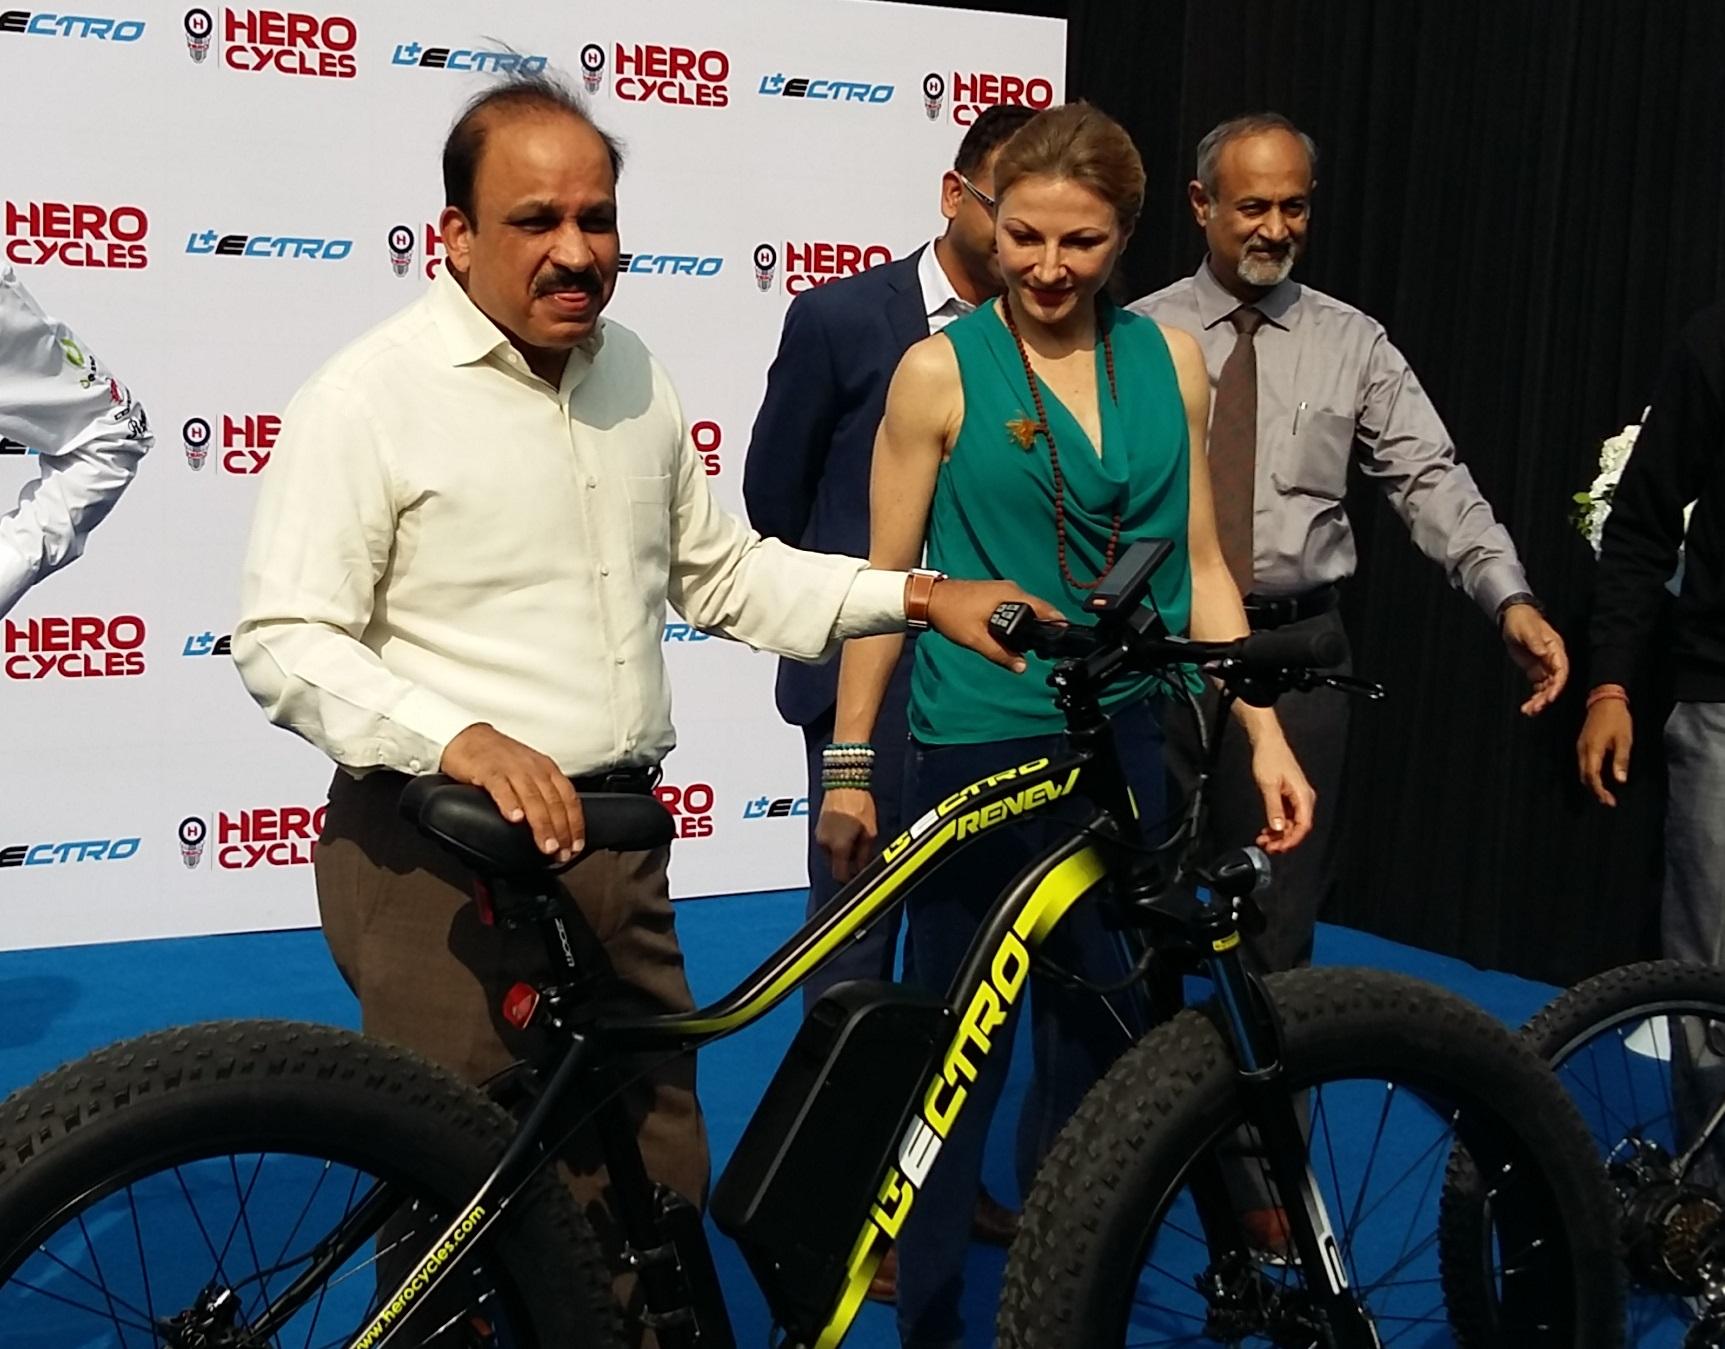 Hero Cycles Targets E-Bike Market - Bike Europe